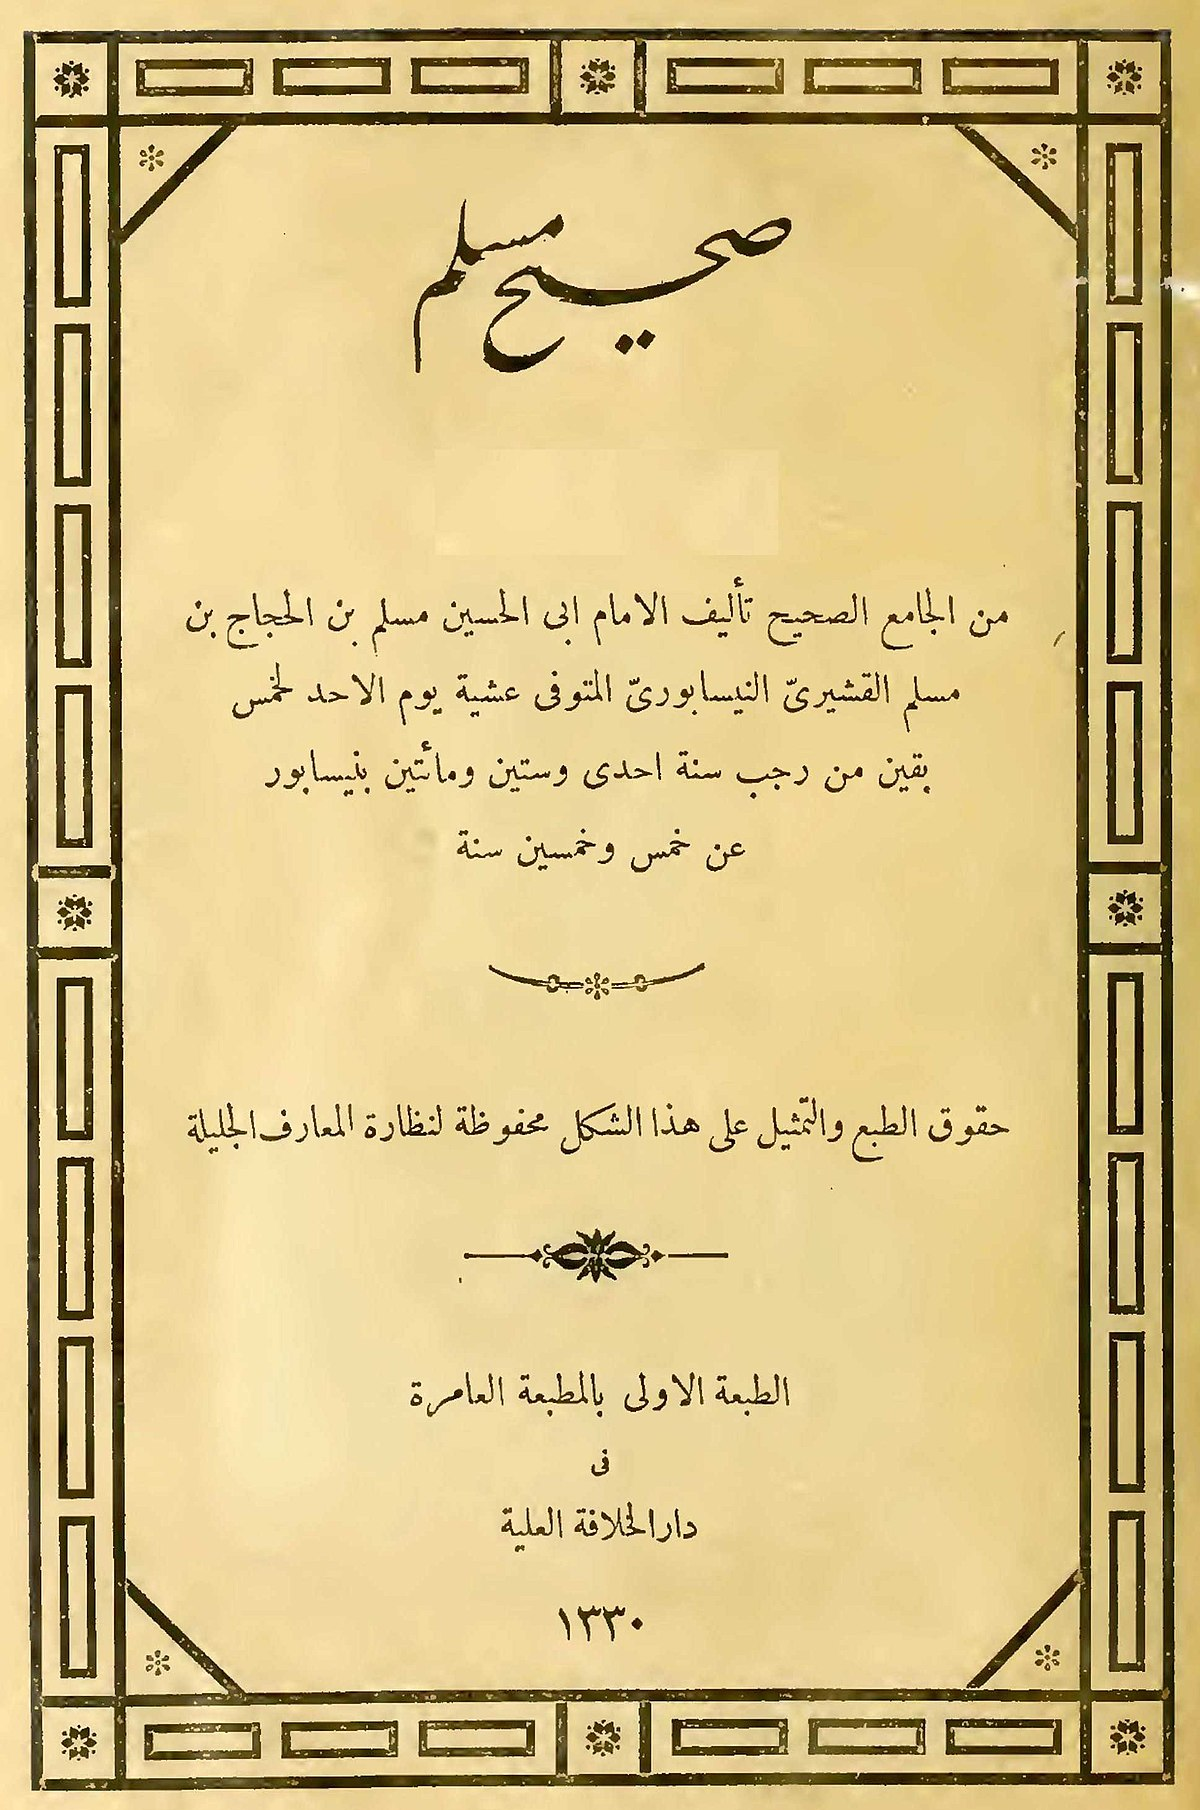 Sahih Muslim - Wikipedia